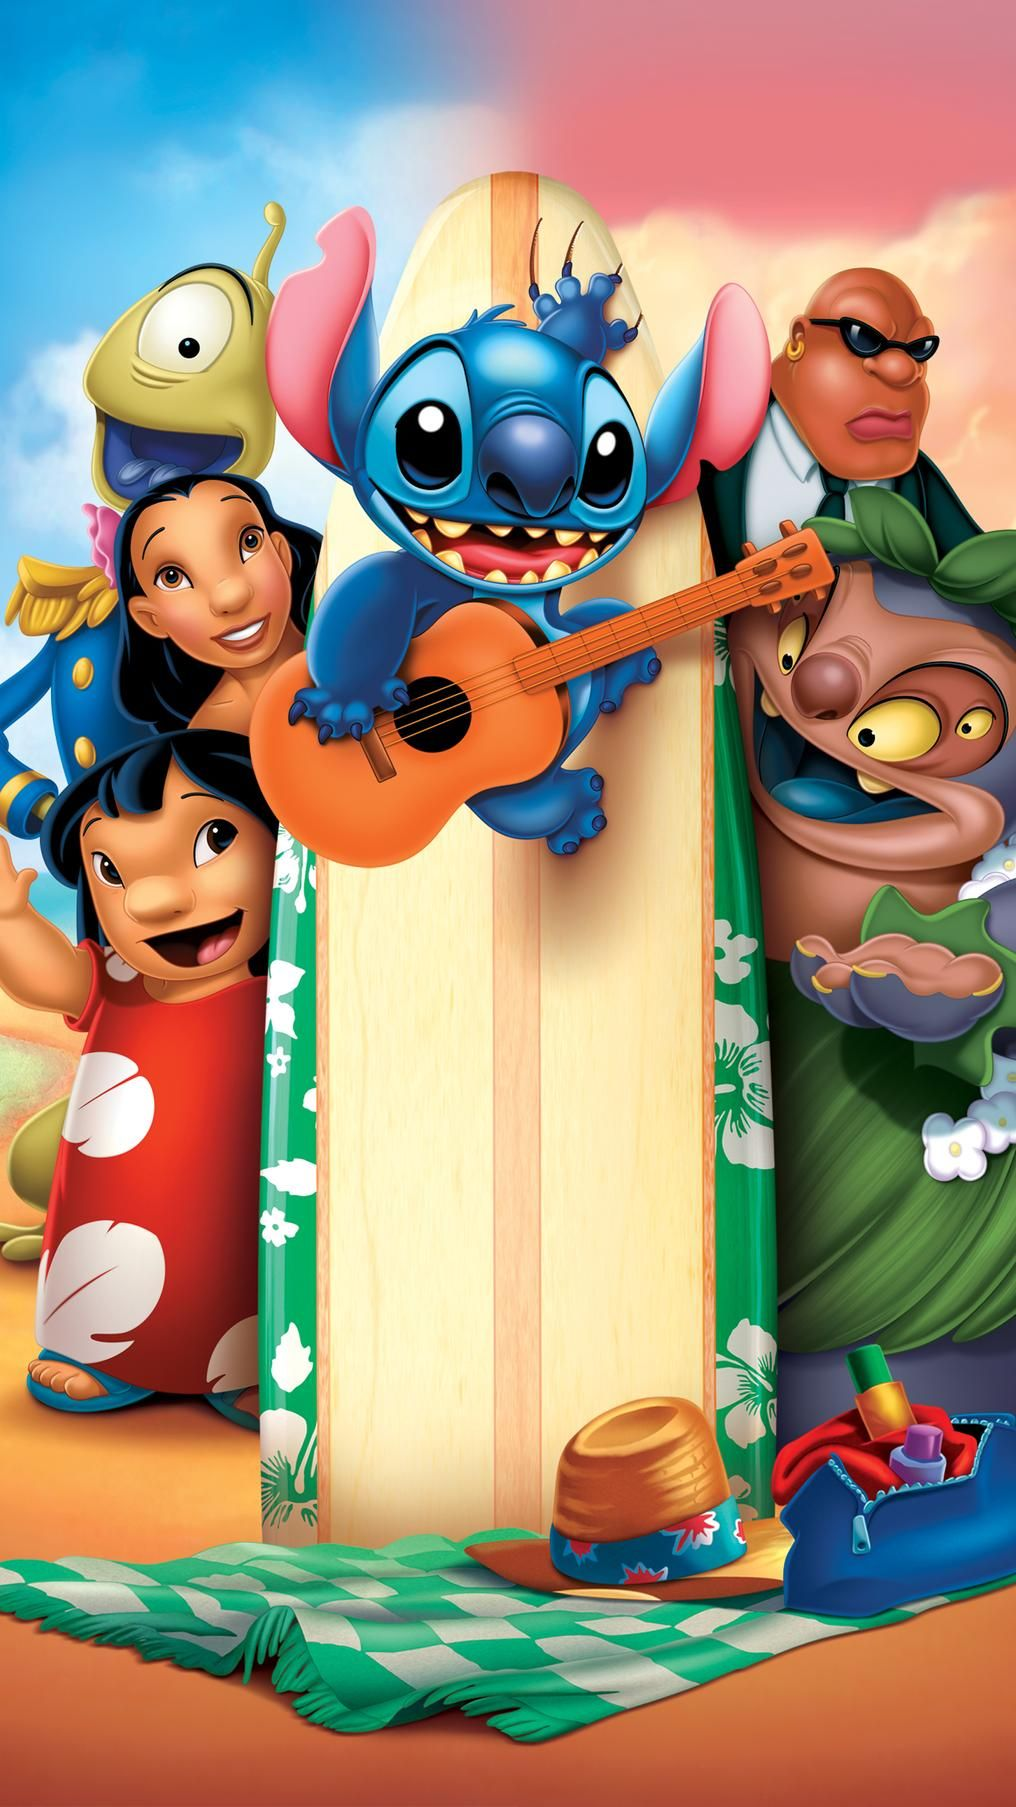 Lilo Stitch 2002 Phone Wallpaper Moviemania Lilo And Stitch 2002 Stitch Disney Disney Characters Lilo